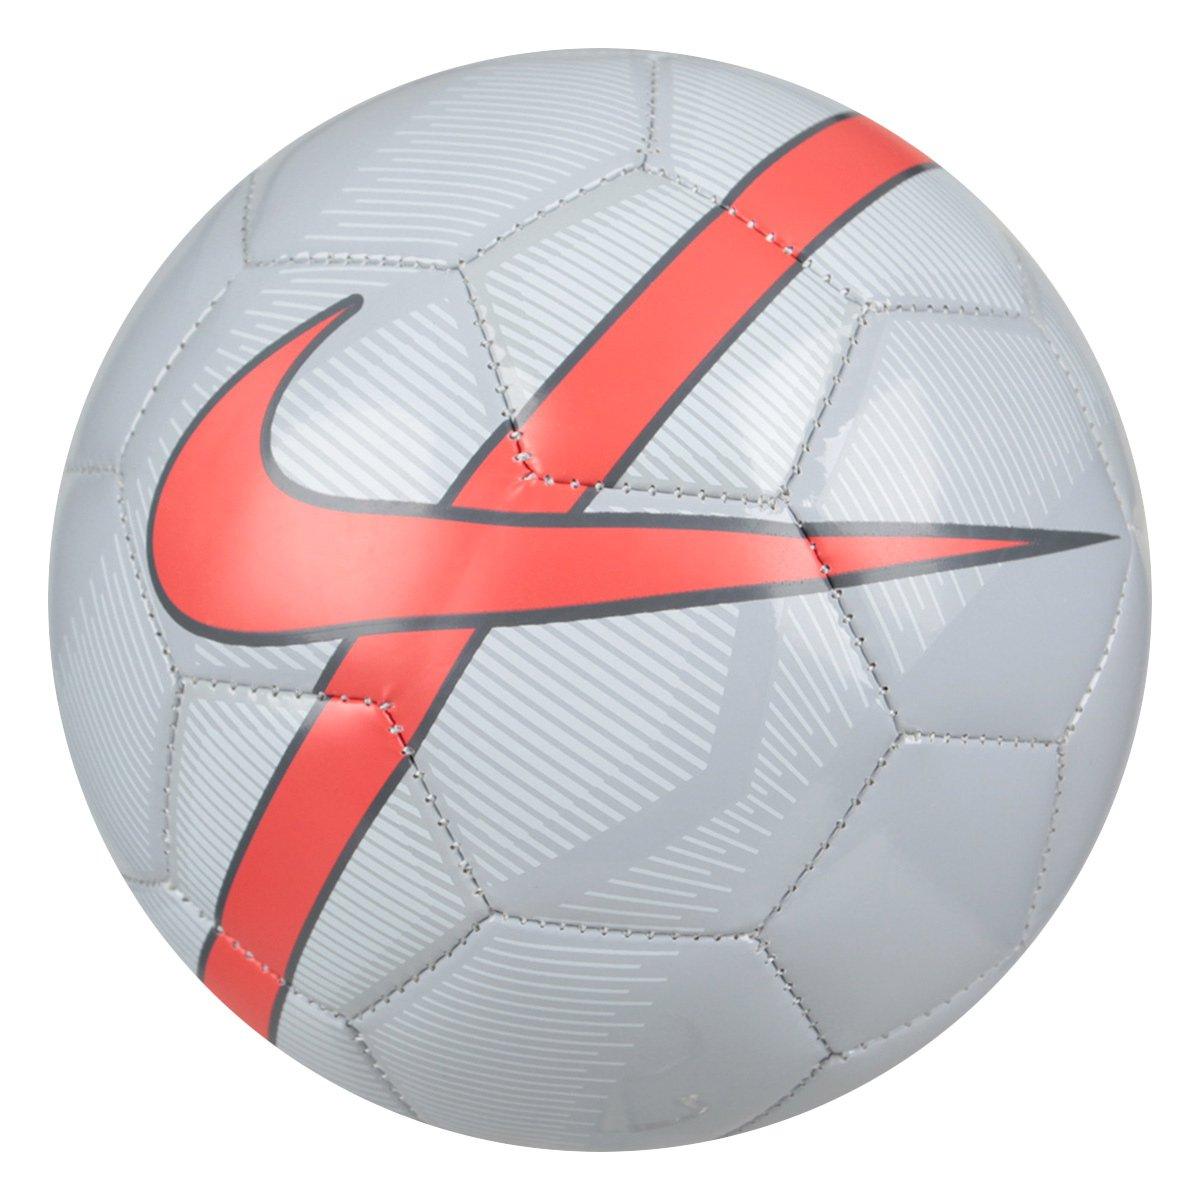 Mini Bola de Futebol Nike Mercurial - Compre Agora  e03d39668aae7